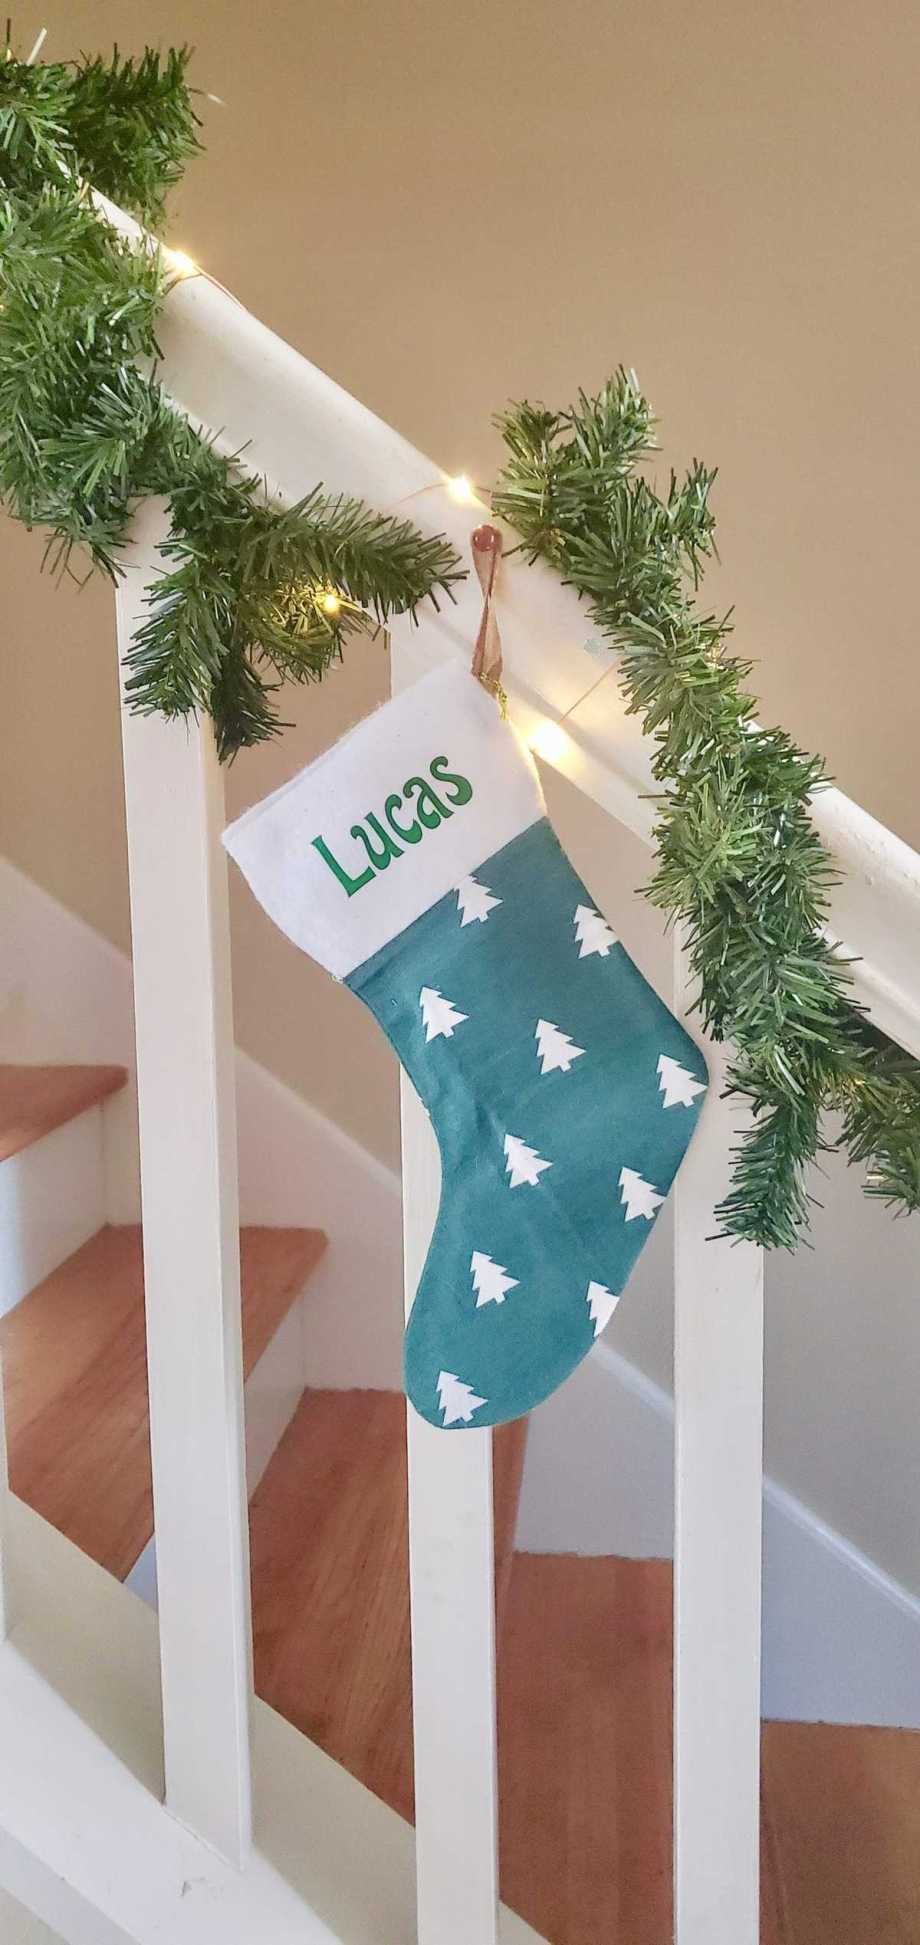 Photo of stocking hanging on stair rail